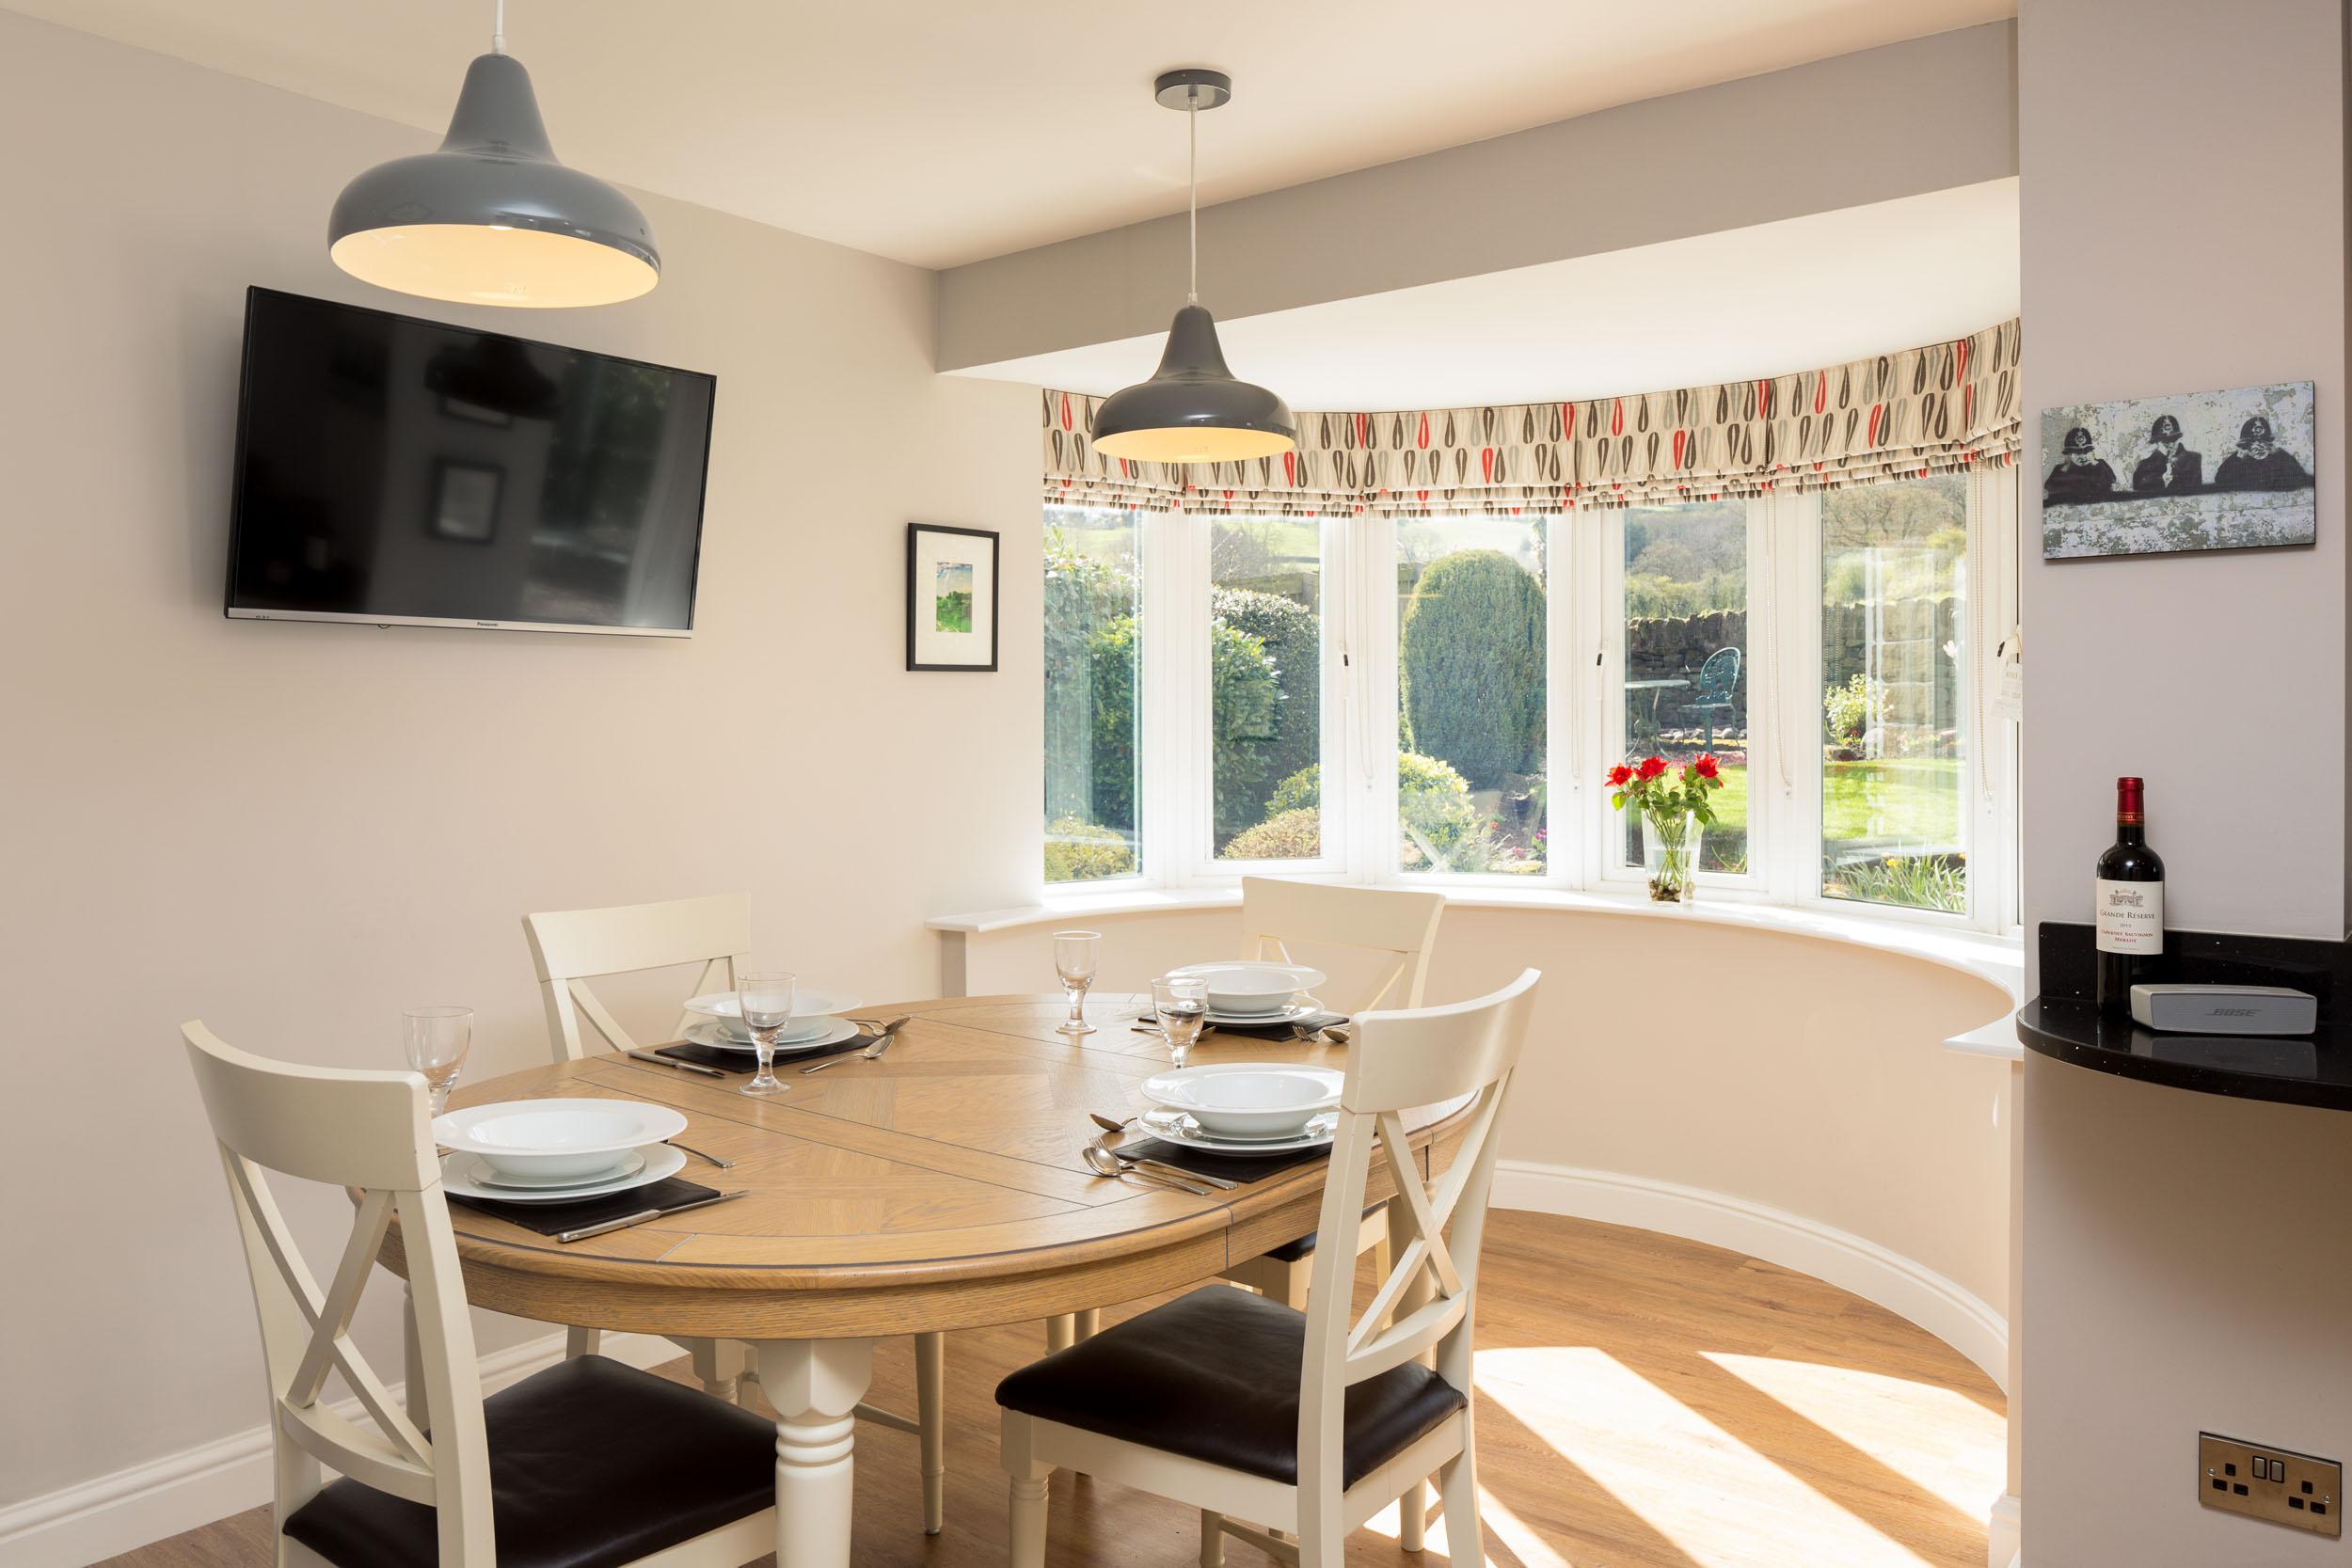 effingham dining bingley bradford west yorkshire uk residential property.jpg